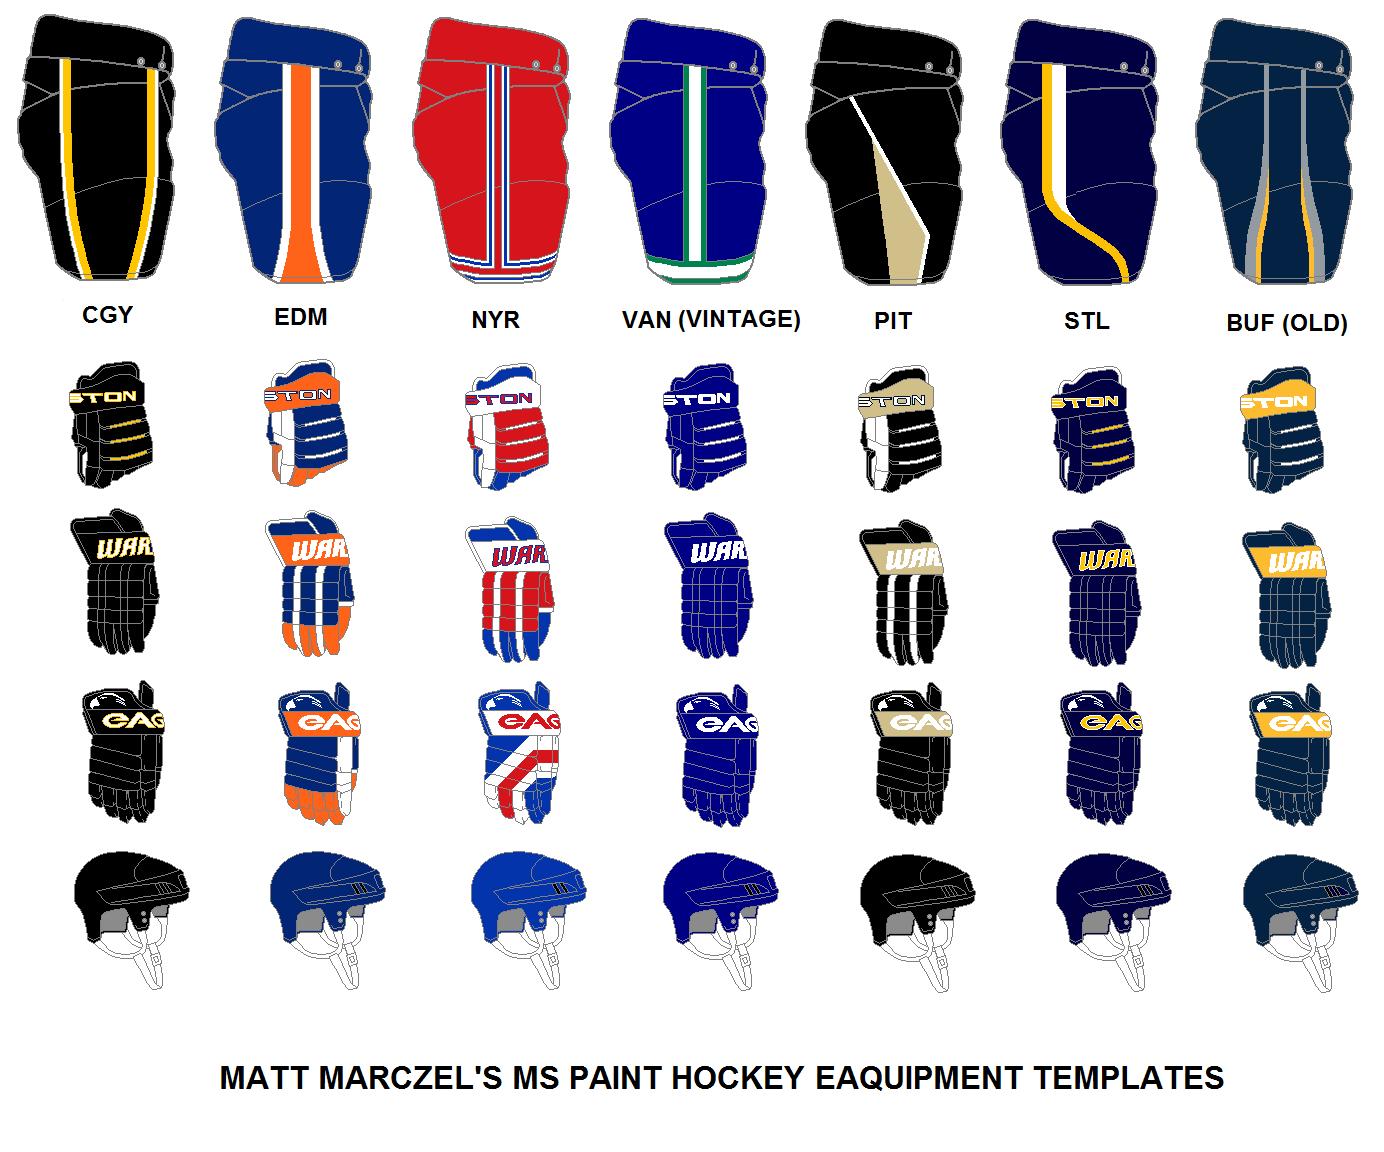 Templates hockeyjerseyconcepts ccm v10 helmet ms paint versions below have a visor maxwellsz